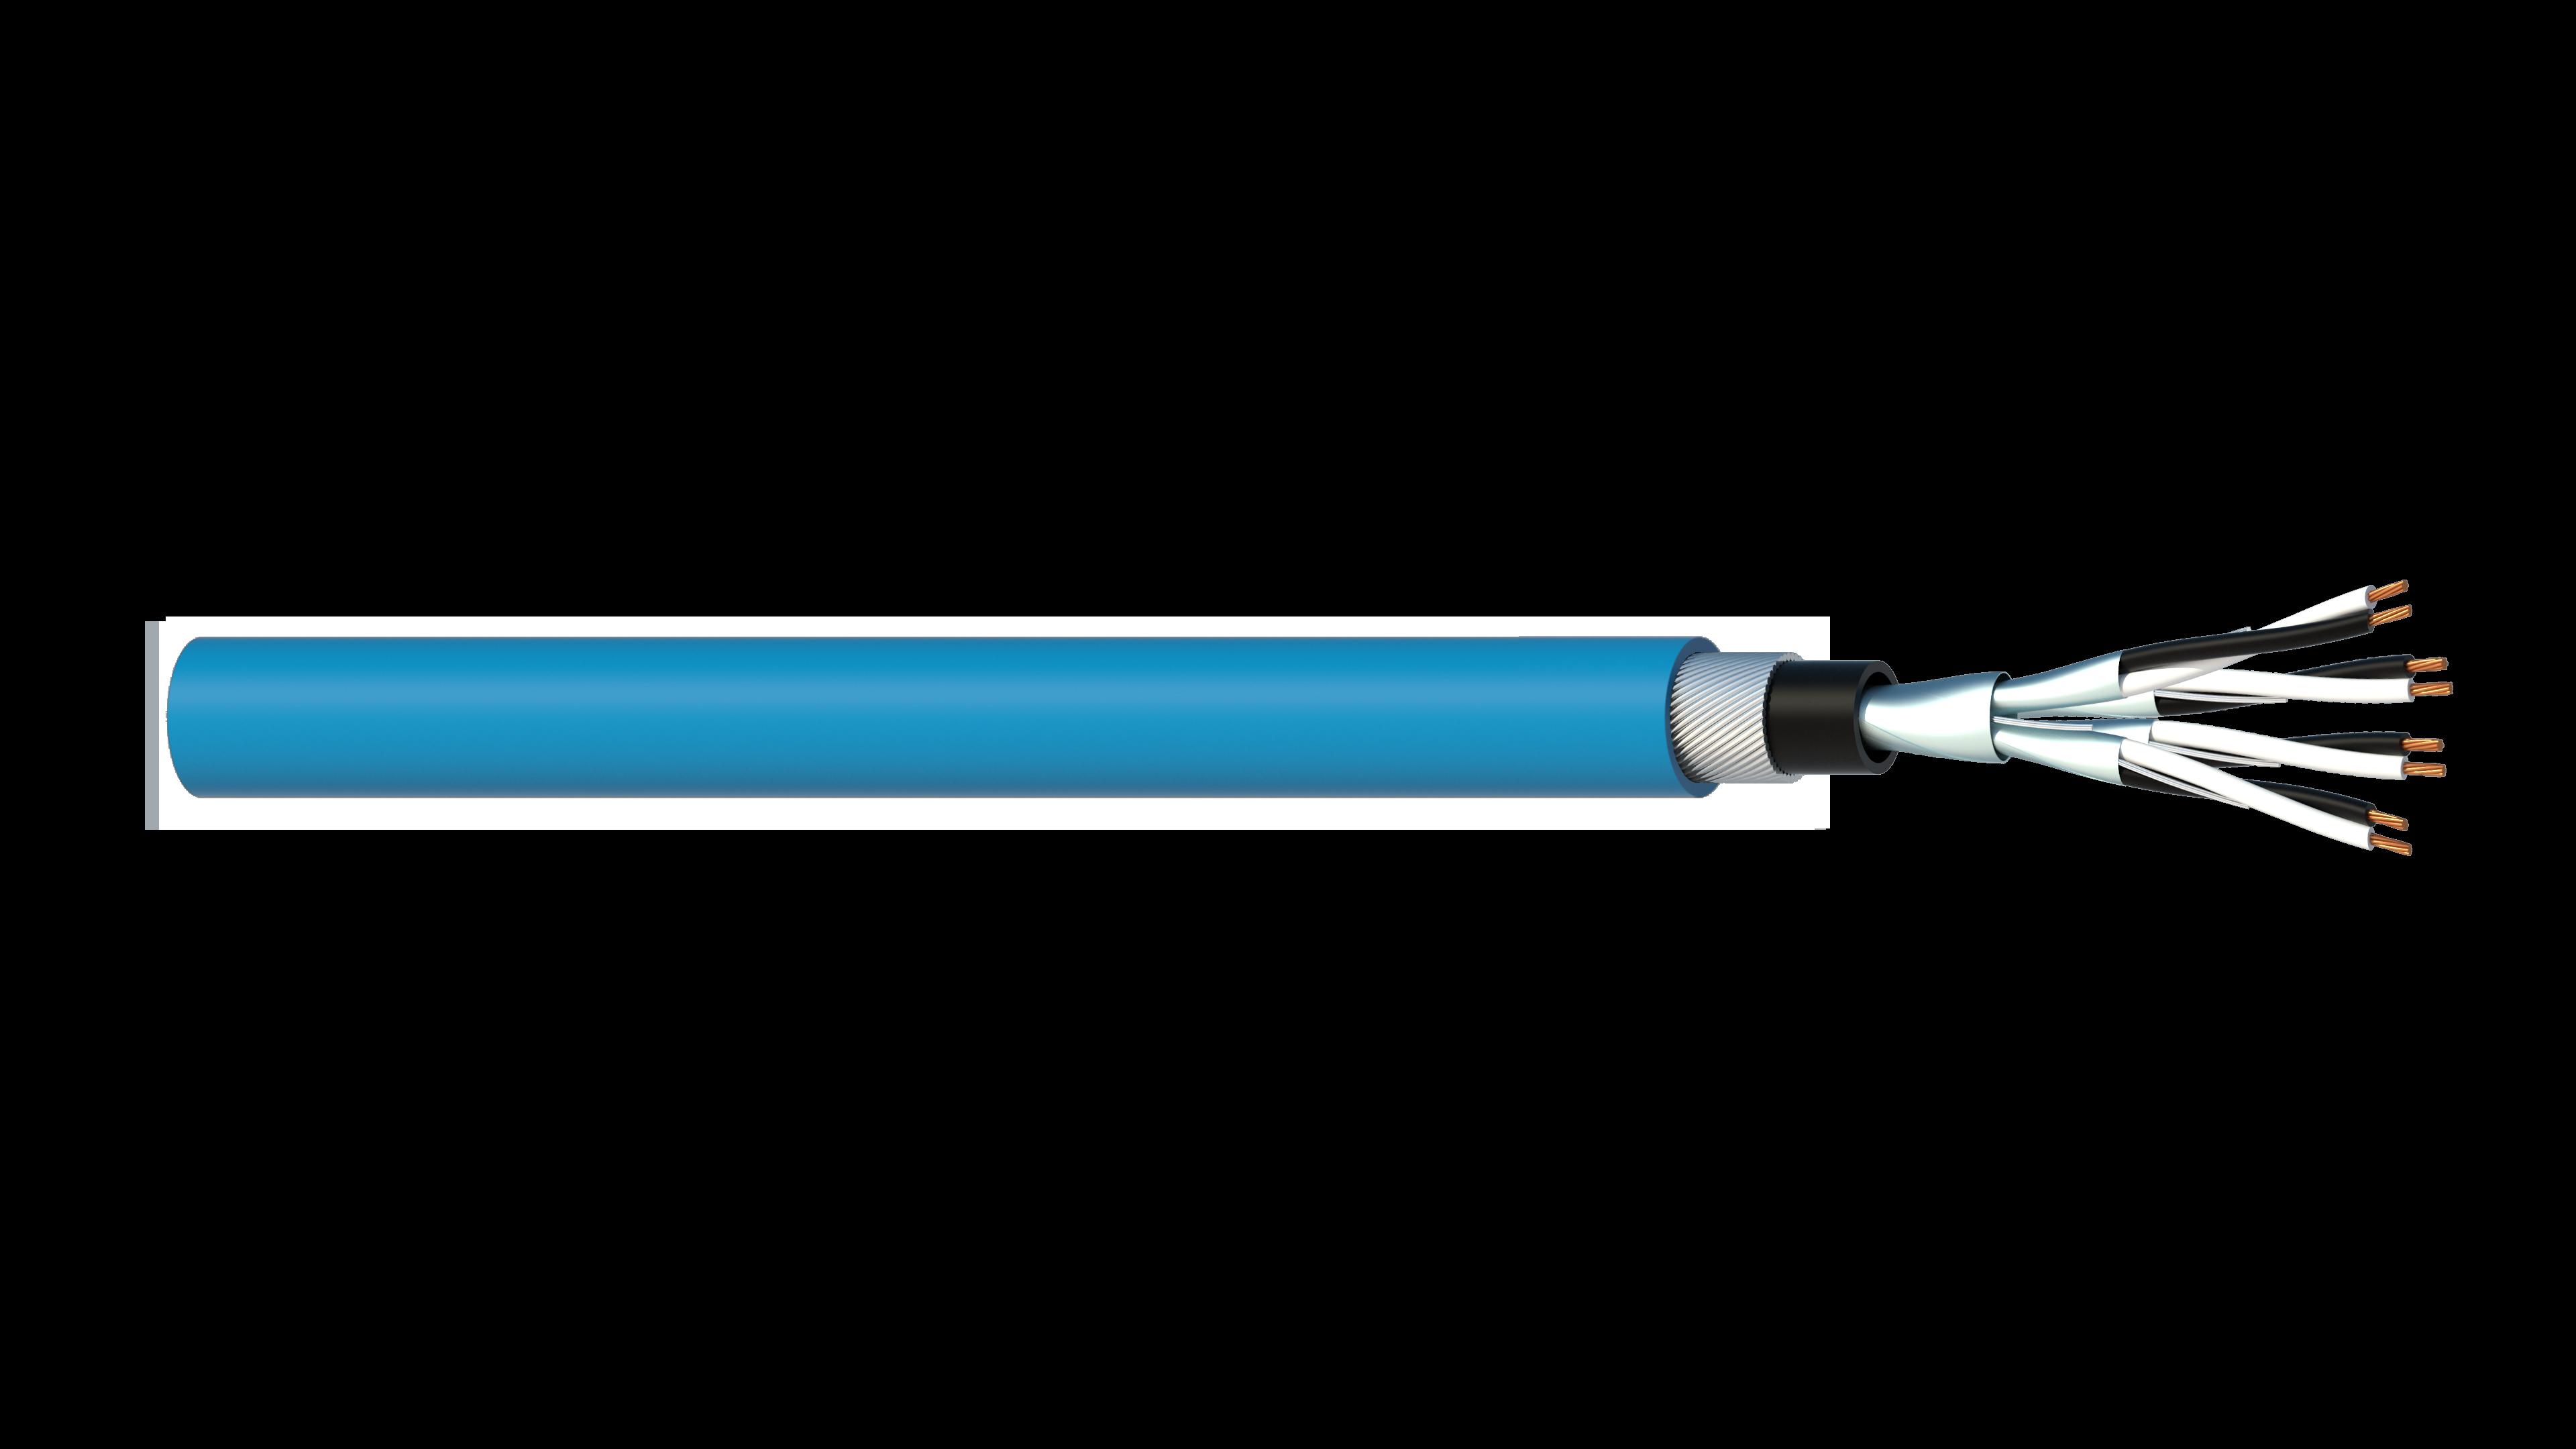 4 Pair 0.5mm2 Cu/PVC/ISOS/PVC/SWA/PVC Maser Instrumentation Cable - Blue Sheath